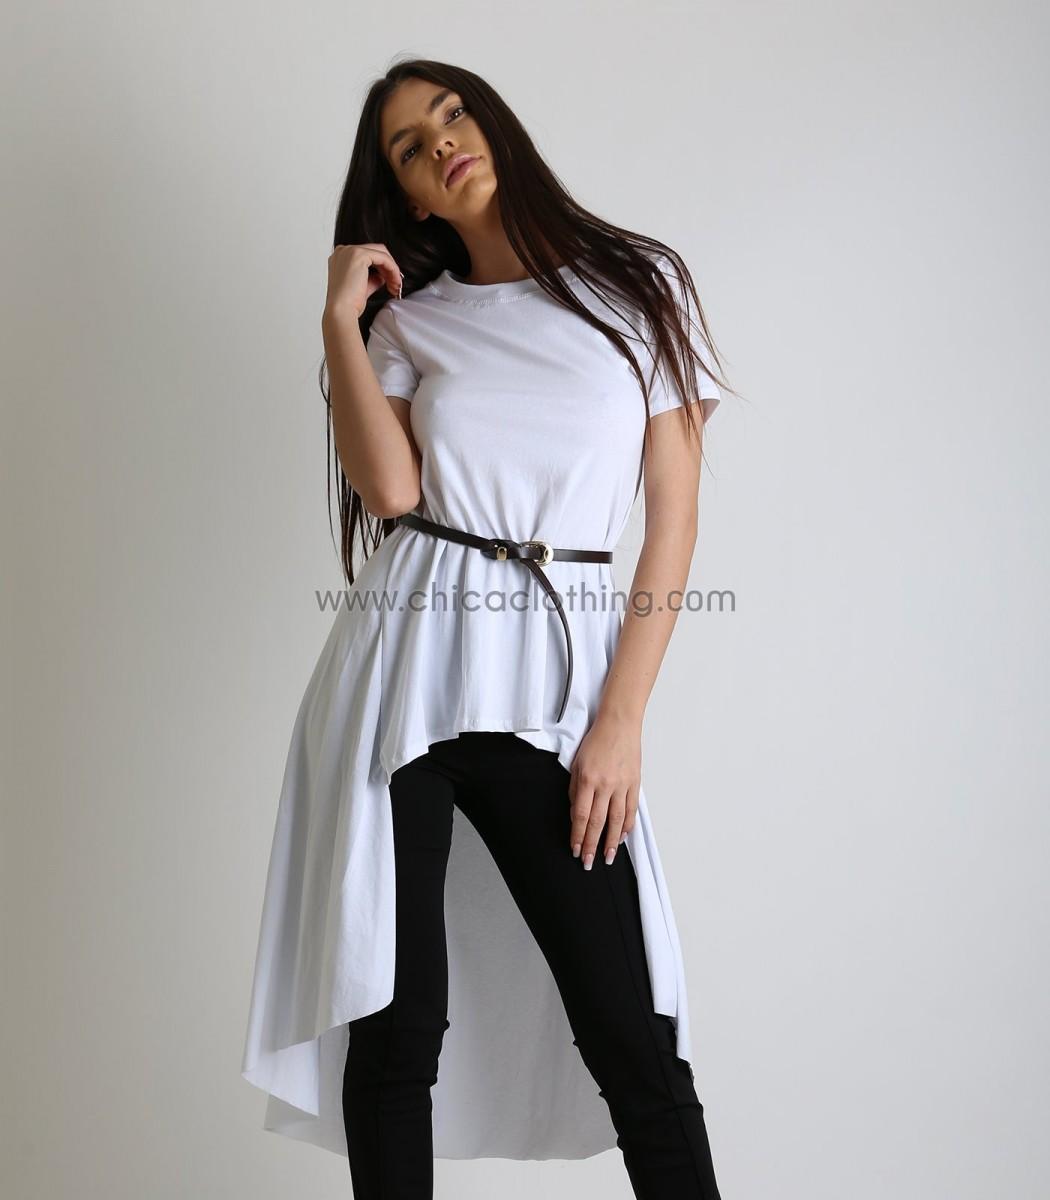 3d61889d5e Γυναικεία μακριά μπλούζα κοντομάνικη με ζώνη (Λευκό)